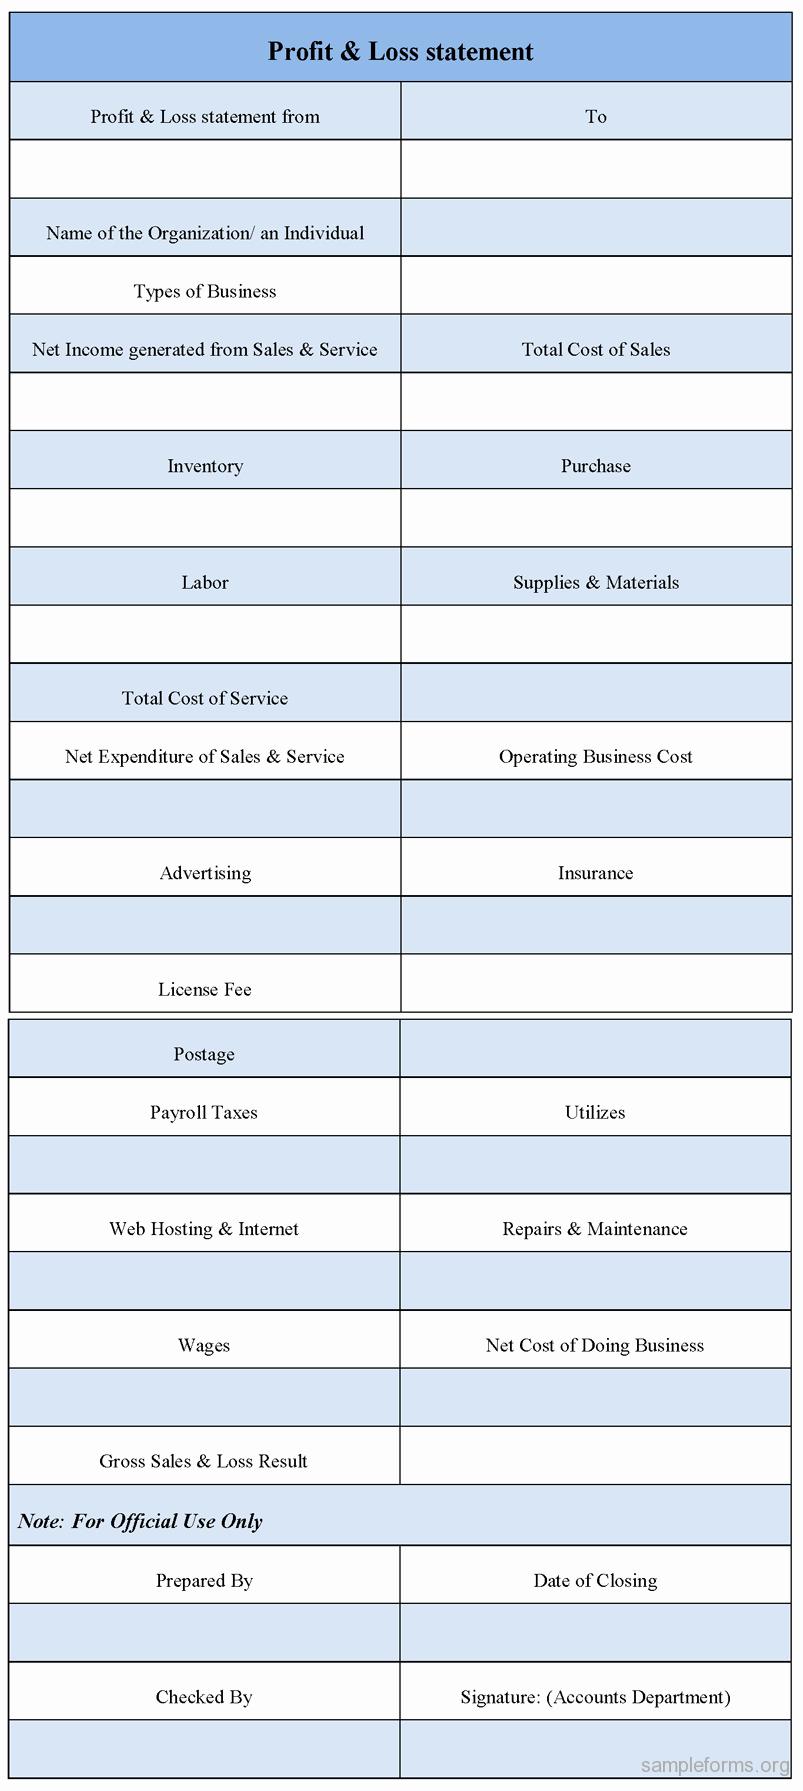 Blank Profit and Loss Sheet New Brilliant Samples Of Blank Profit and Loss Statement form